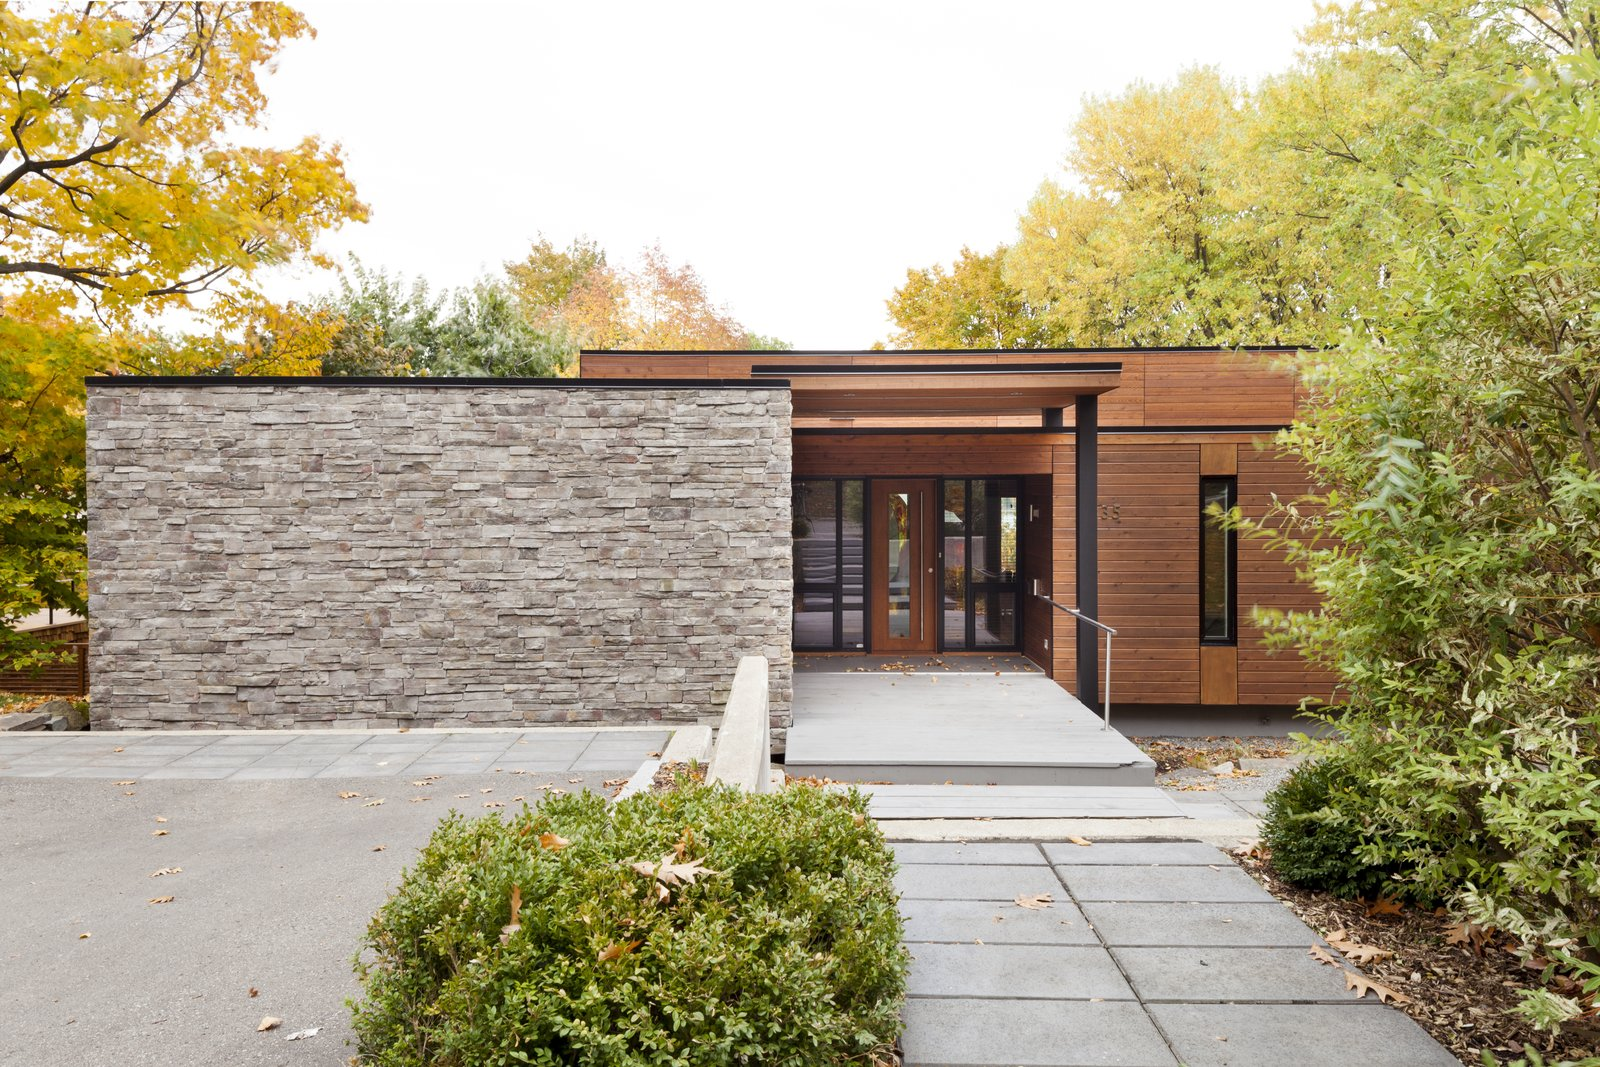 Front yard at Rue de l'Anse residence - Quebec city, Canada  Rue de l'Anse residence by PARKA - Architecture & Design